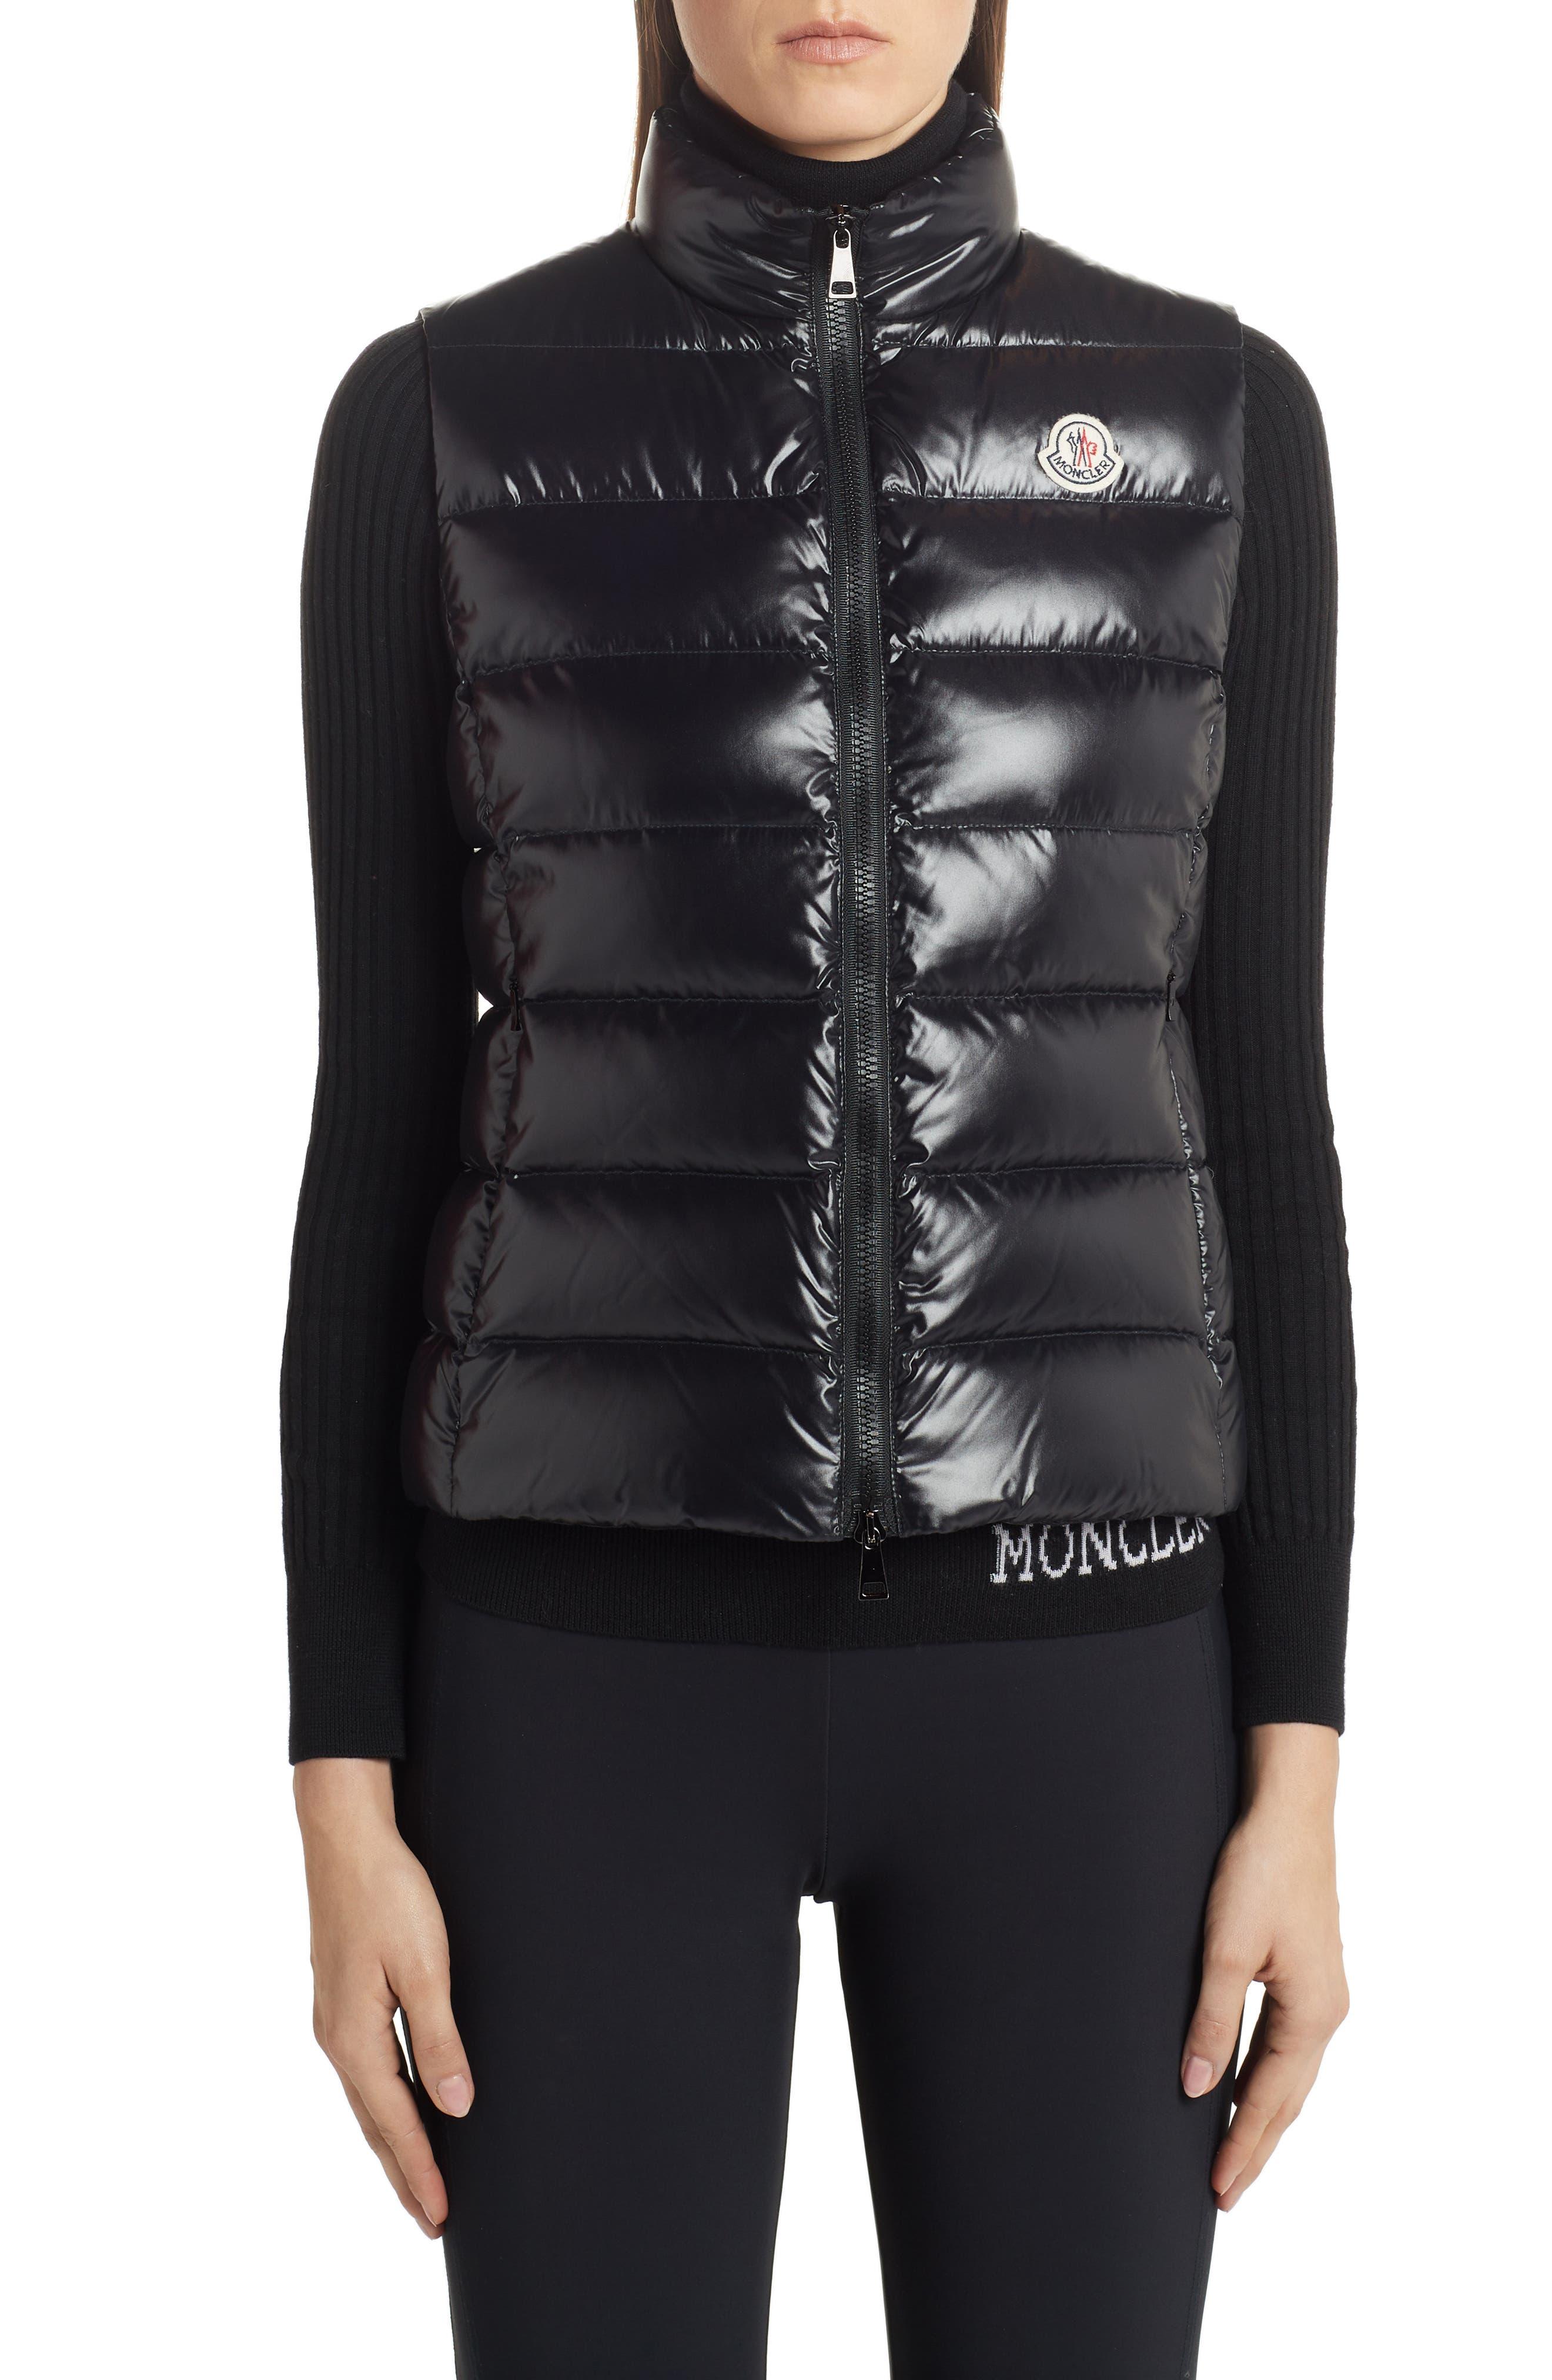 Women's Moncler Clothing | Nordstrom